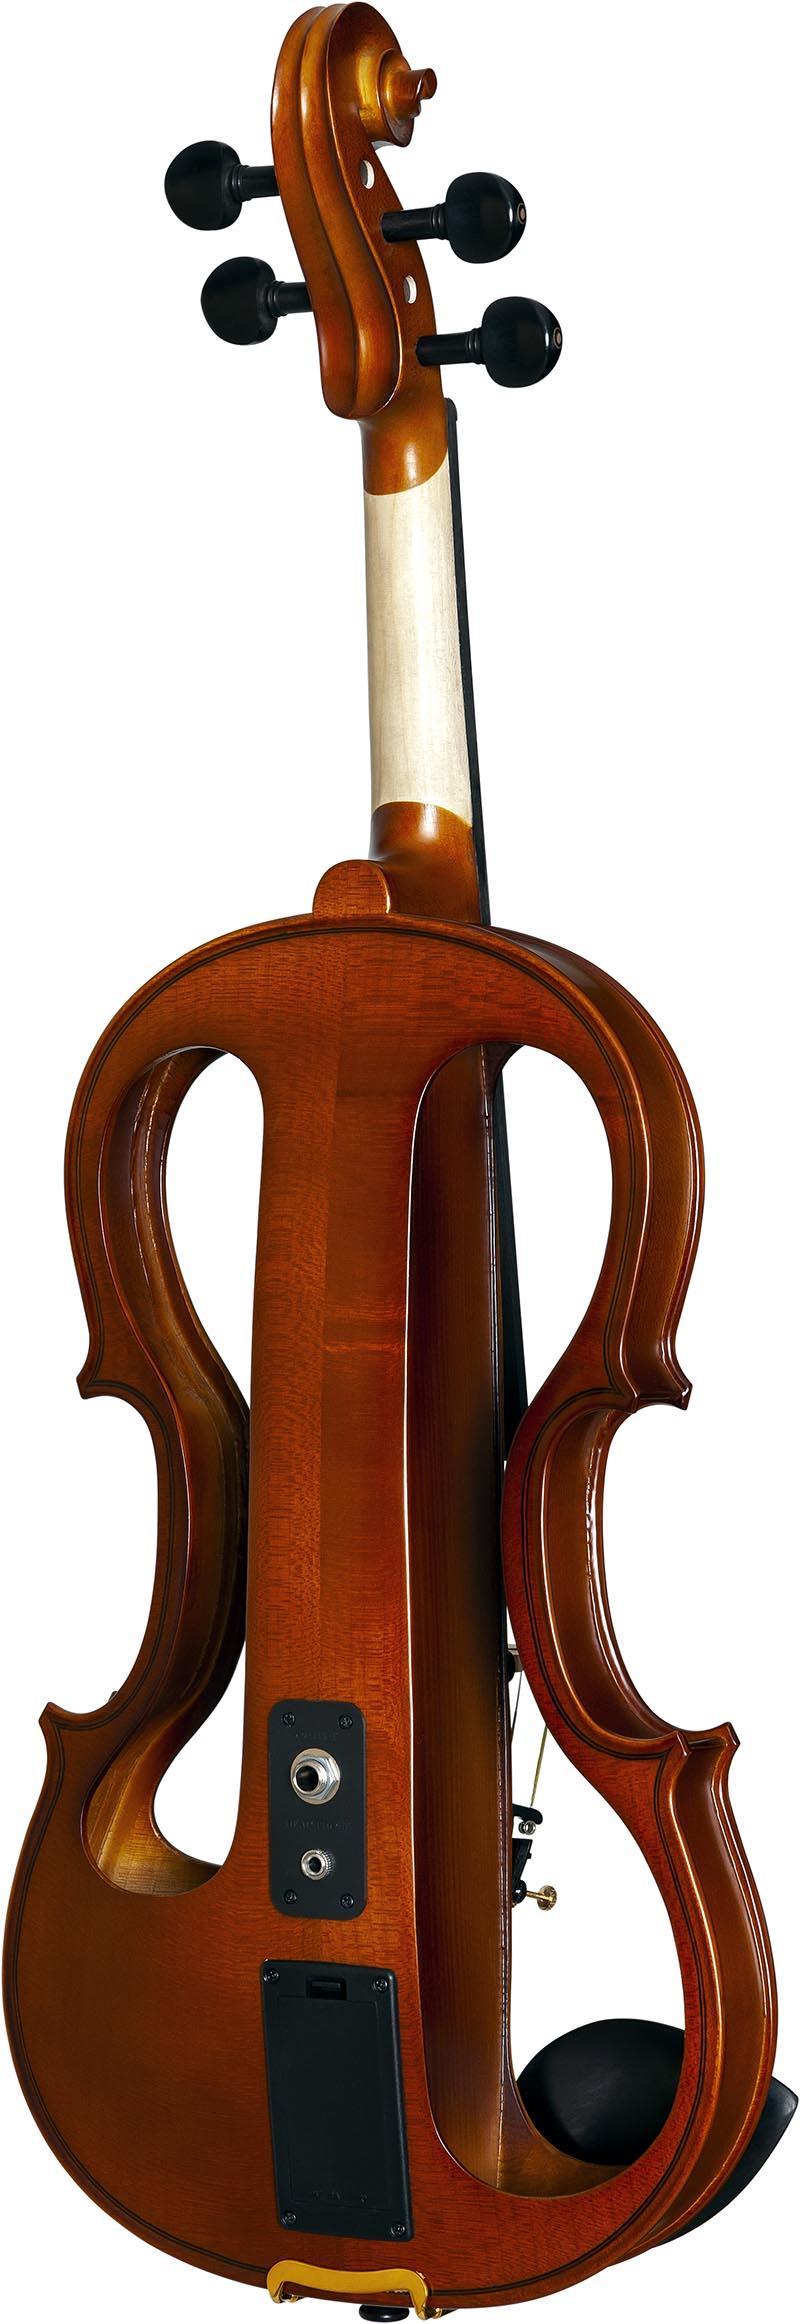 ev744 violino eagle ev744 visao posterior vertical